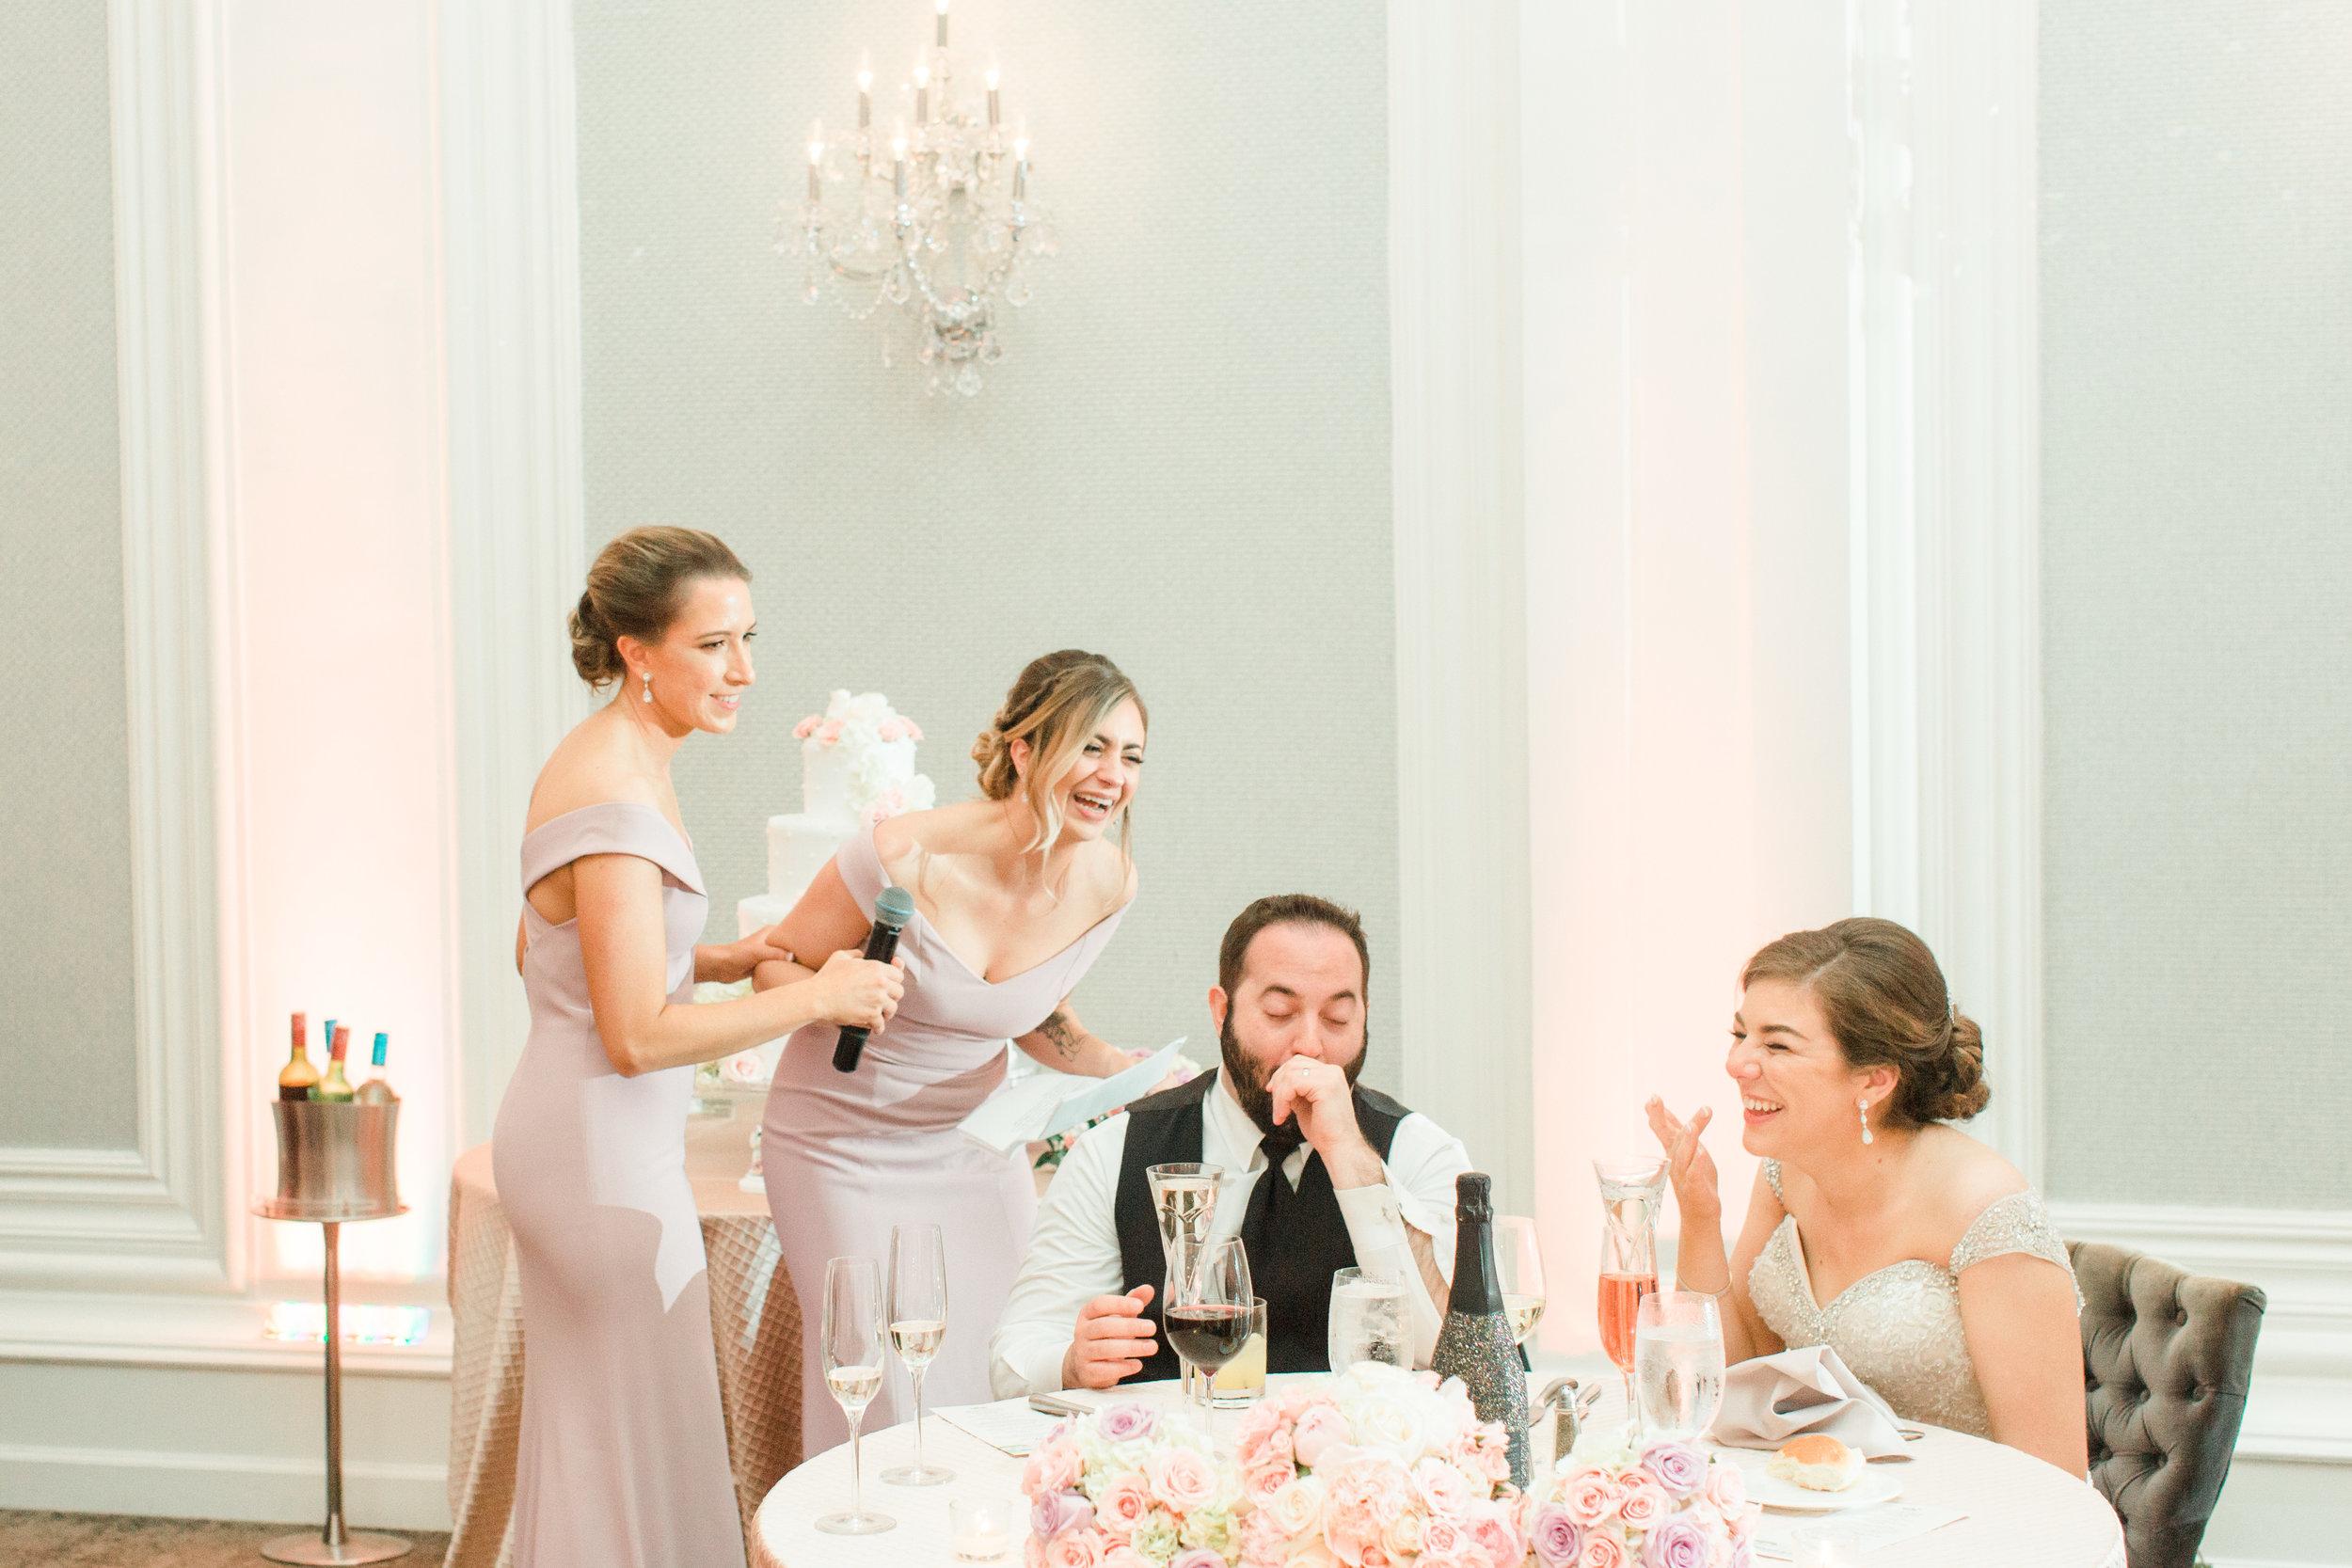 kellyandjoe_wedding (797 of 1296).jpg